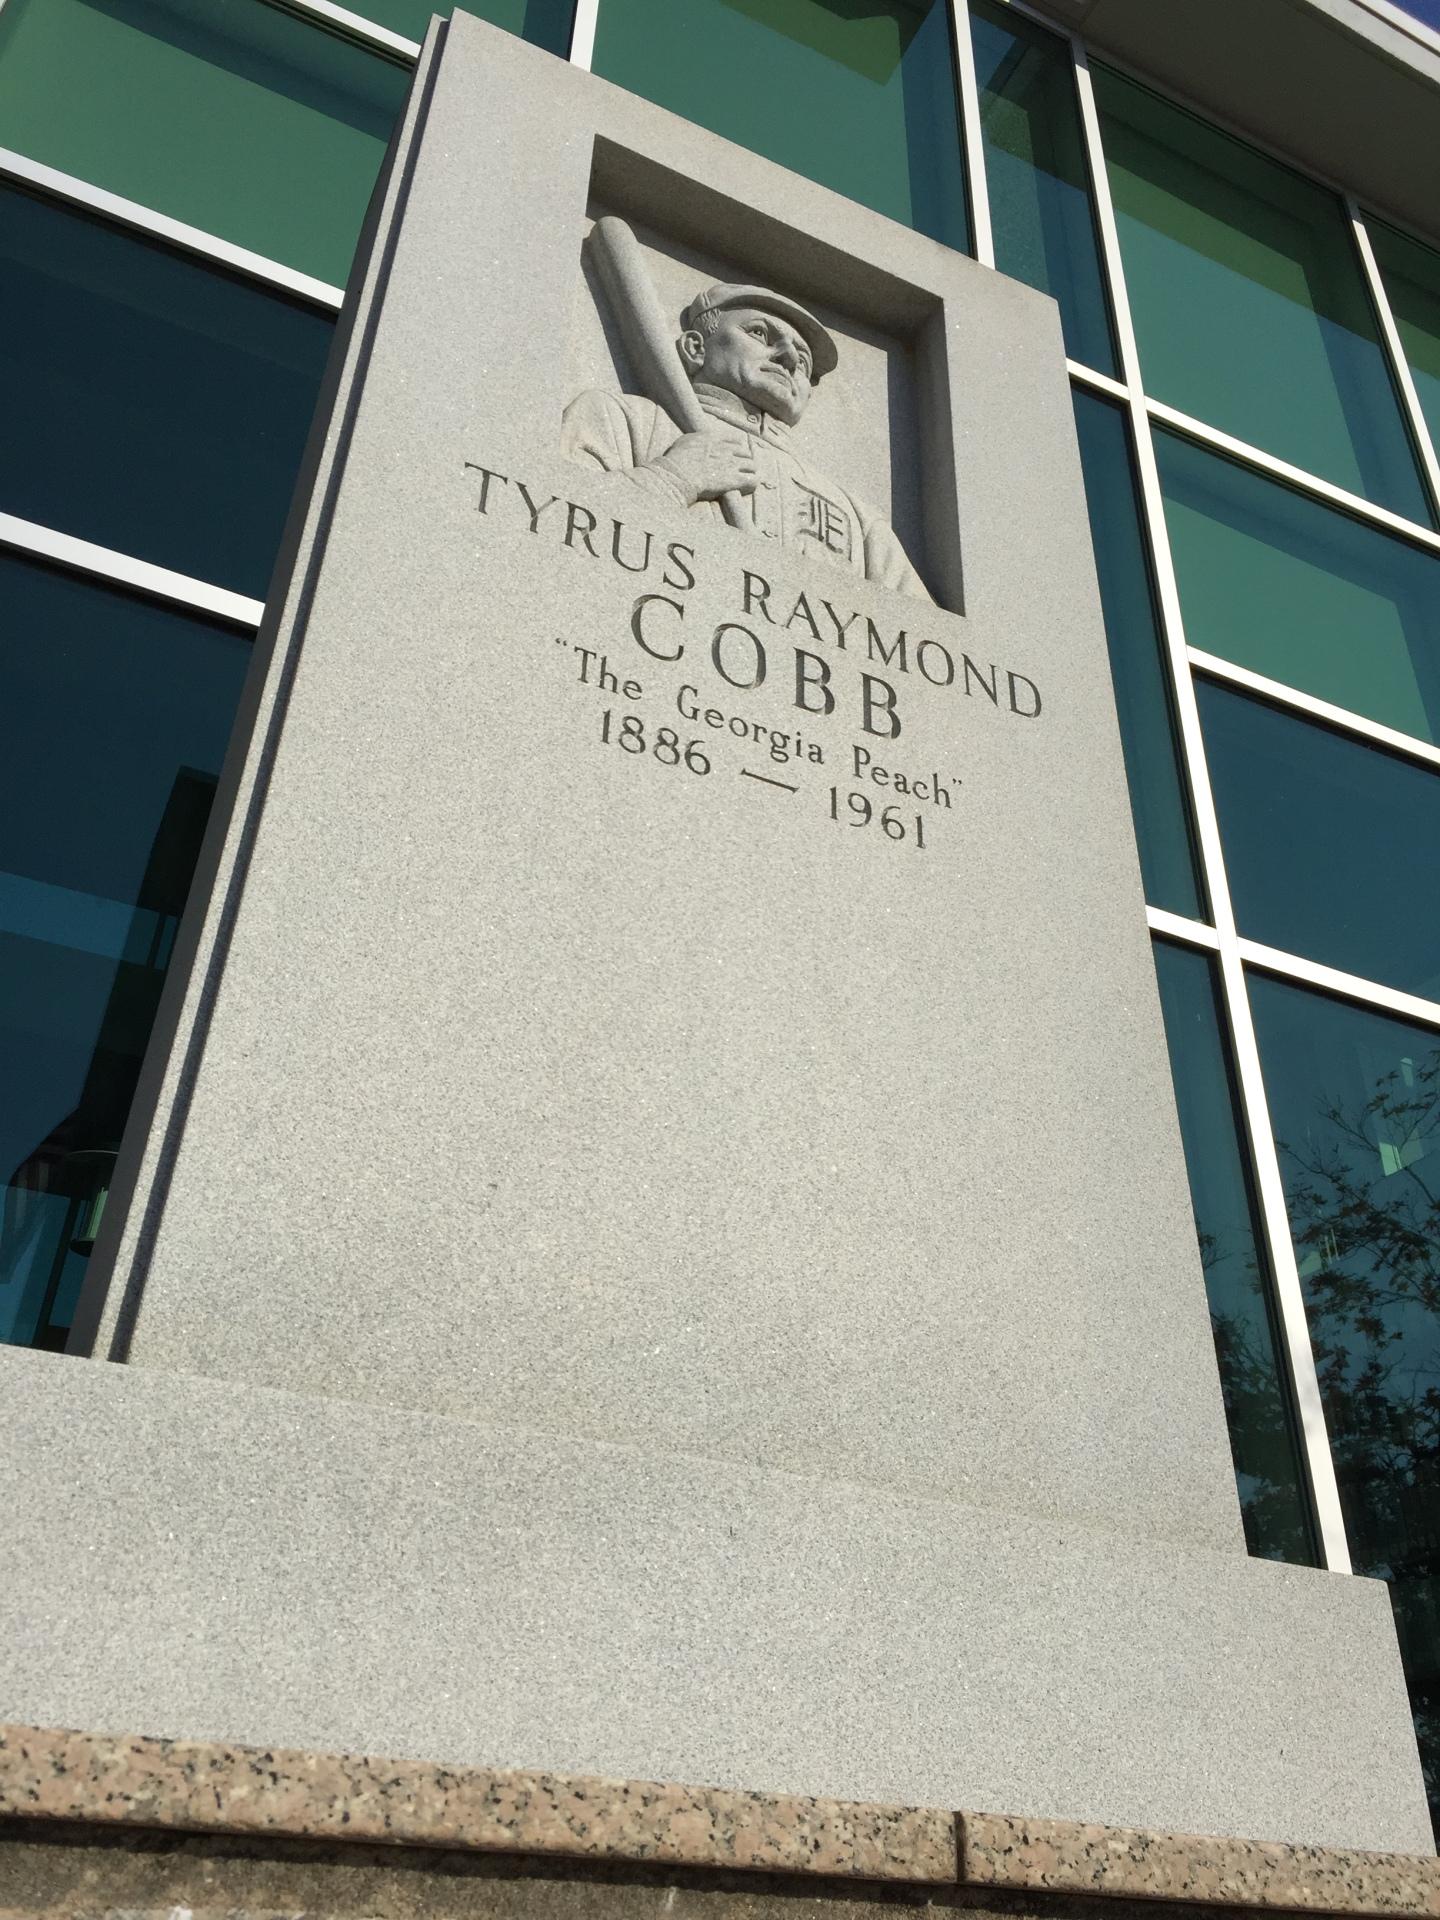 TY COBB Memorial In Royston, Georgia